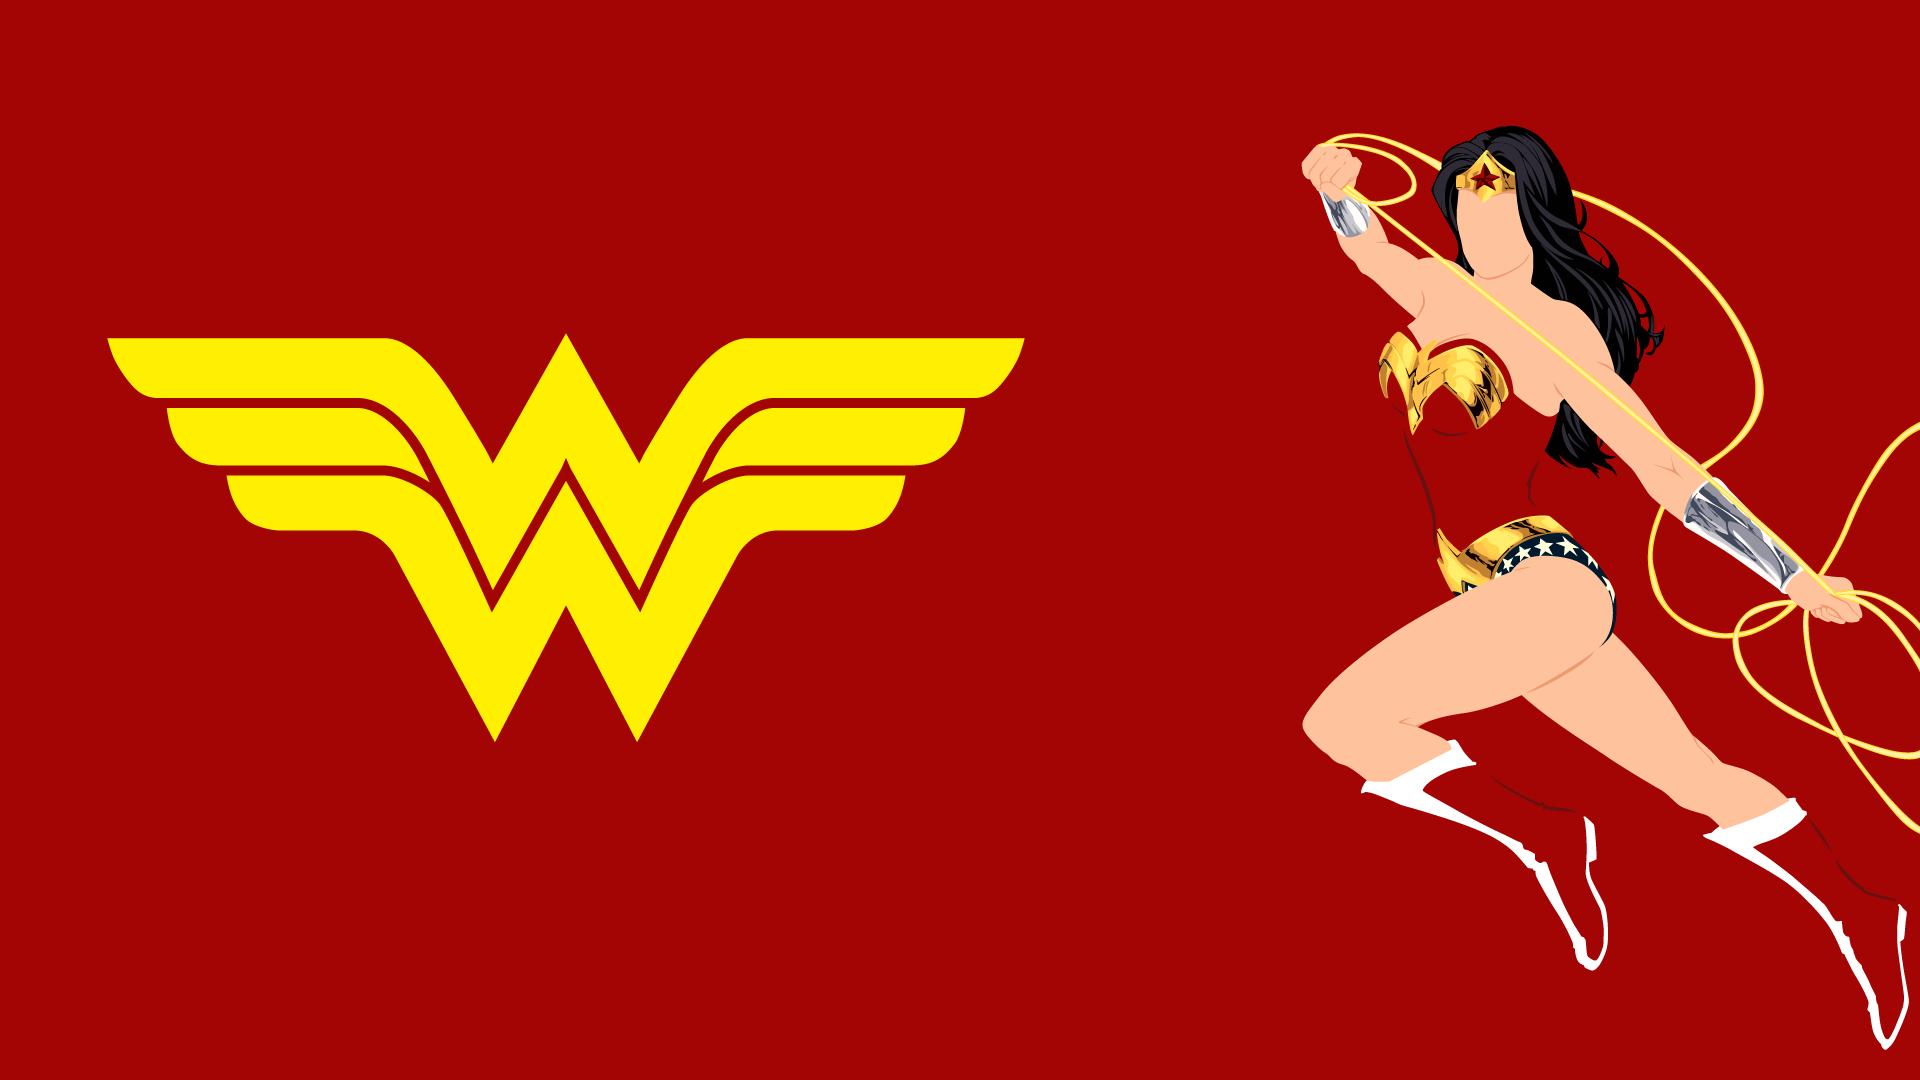 Wonder Woman Logo Wallpapers 1920x1080